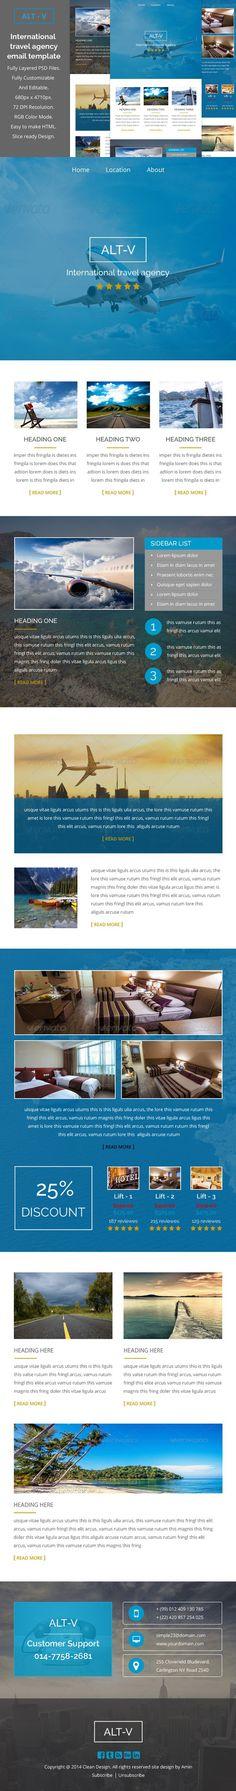 ALT-V travel agency email template